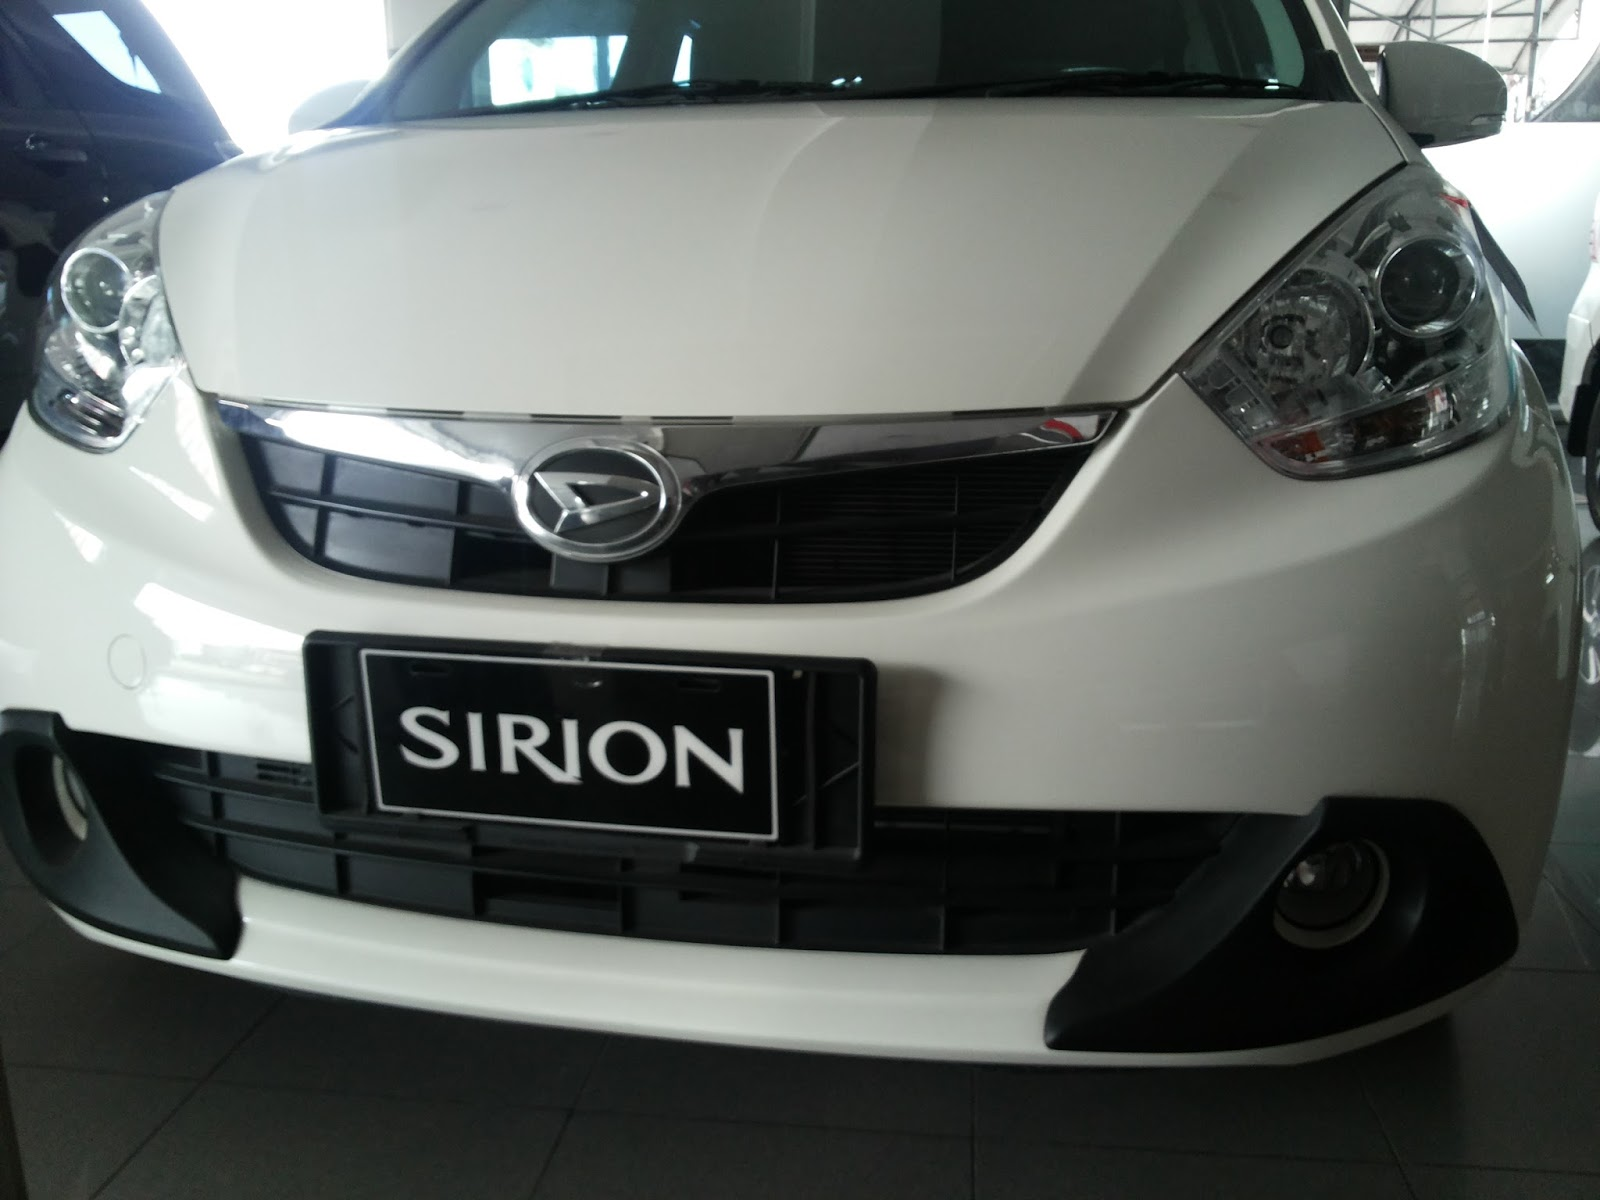 Daihatsu Sirion Deluxe